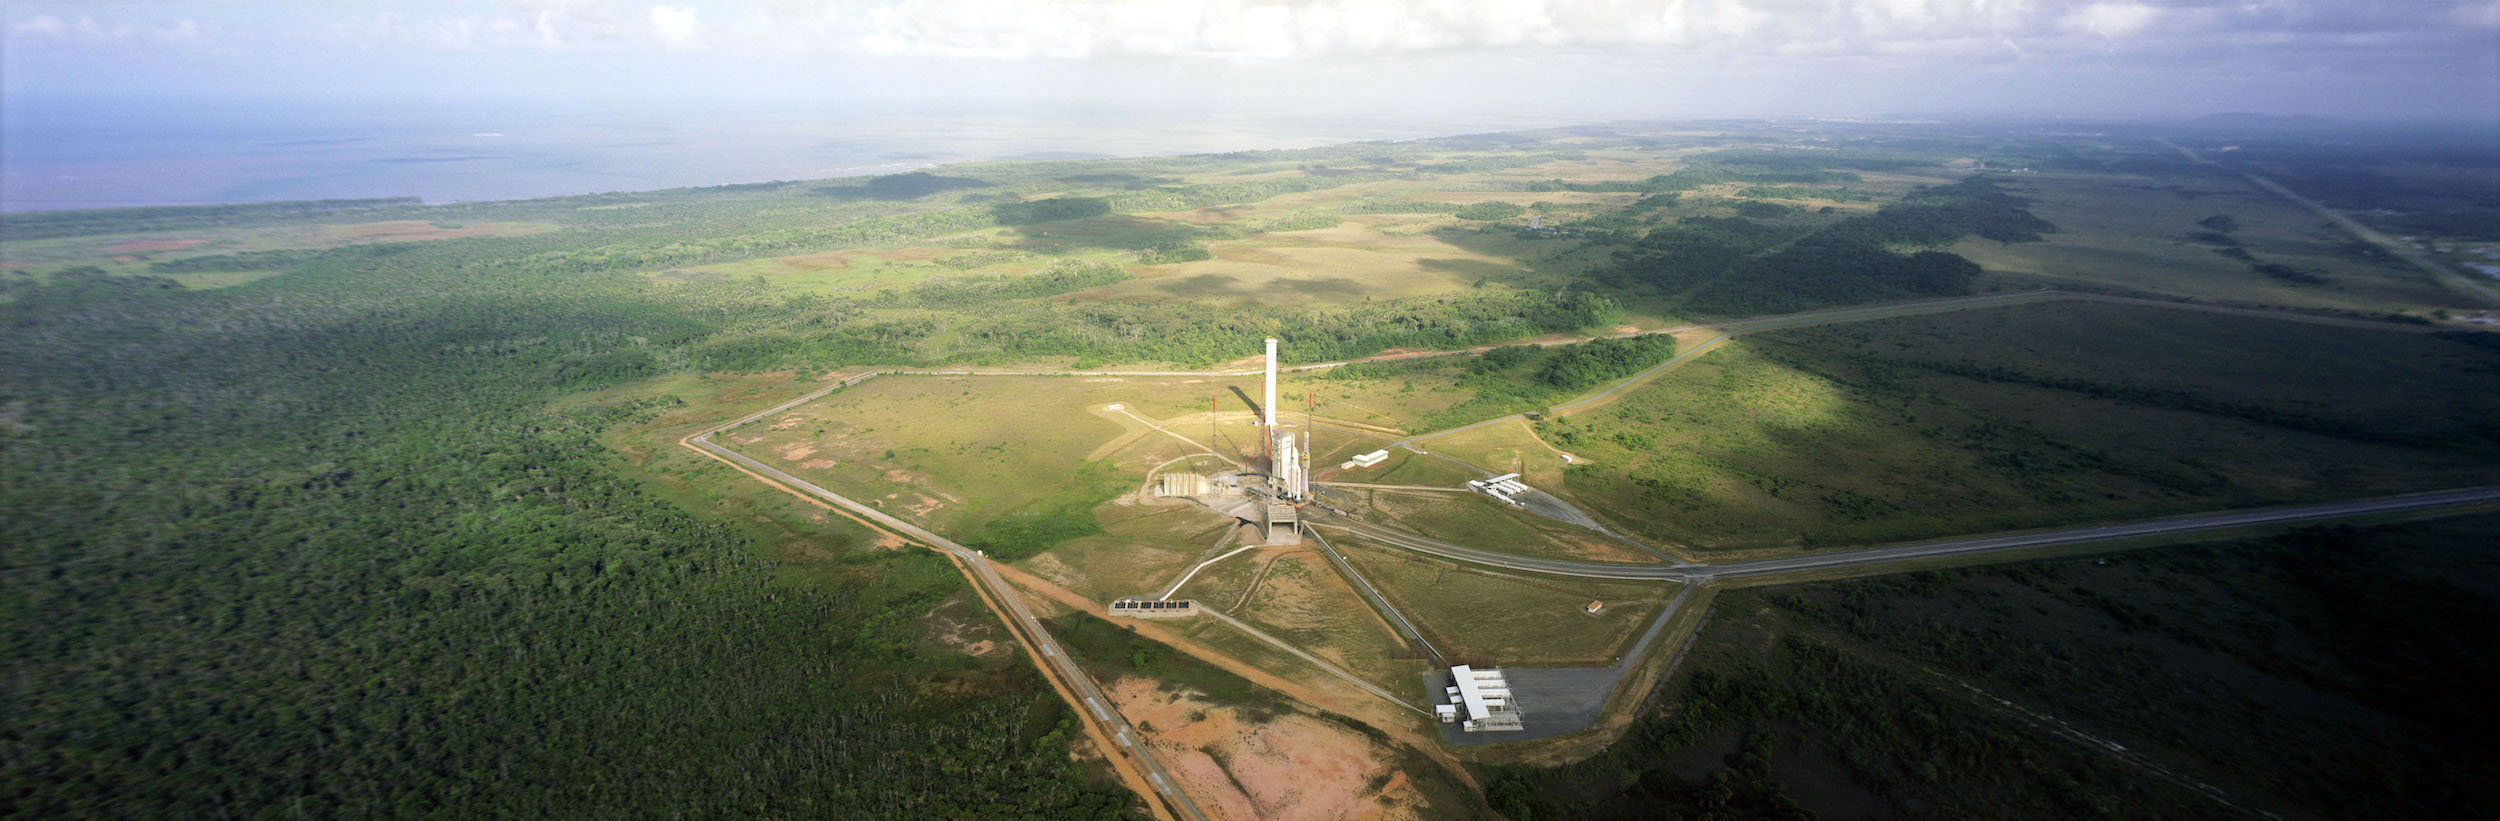 Centre spatial guyanais - Kourou